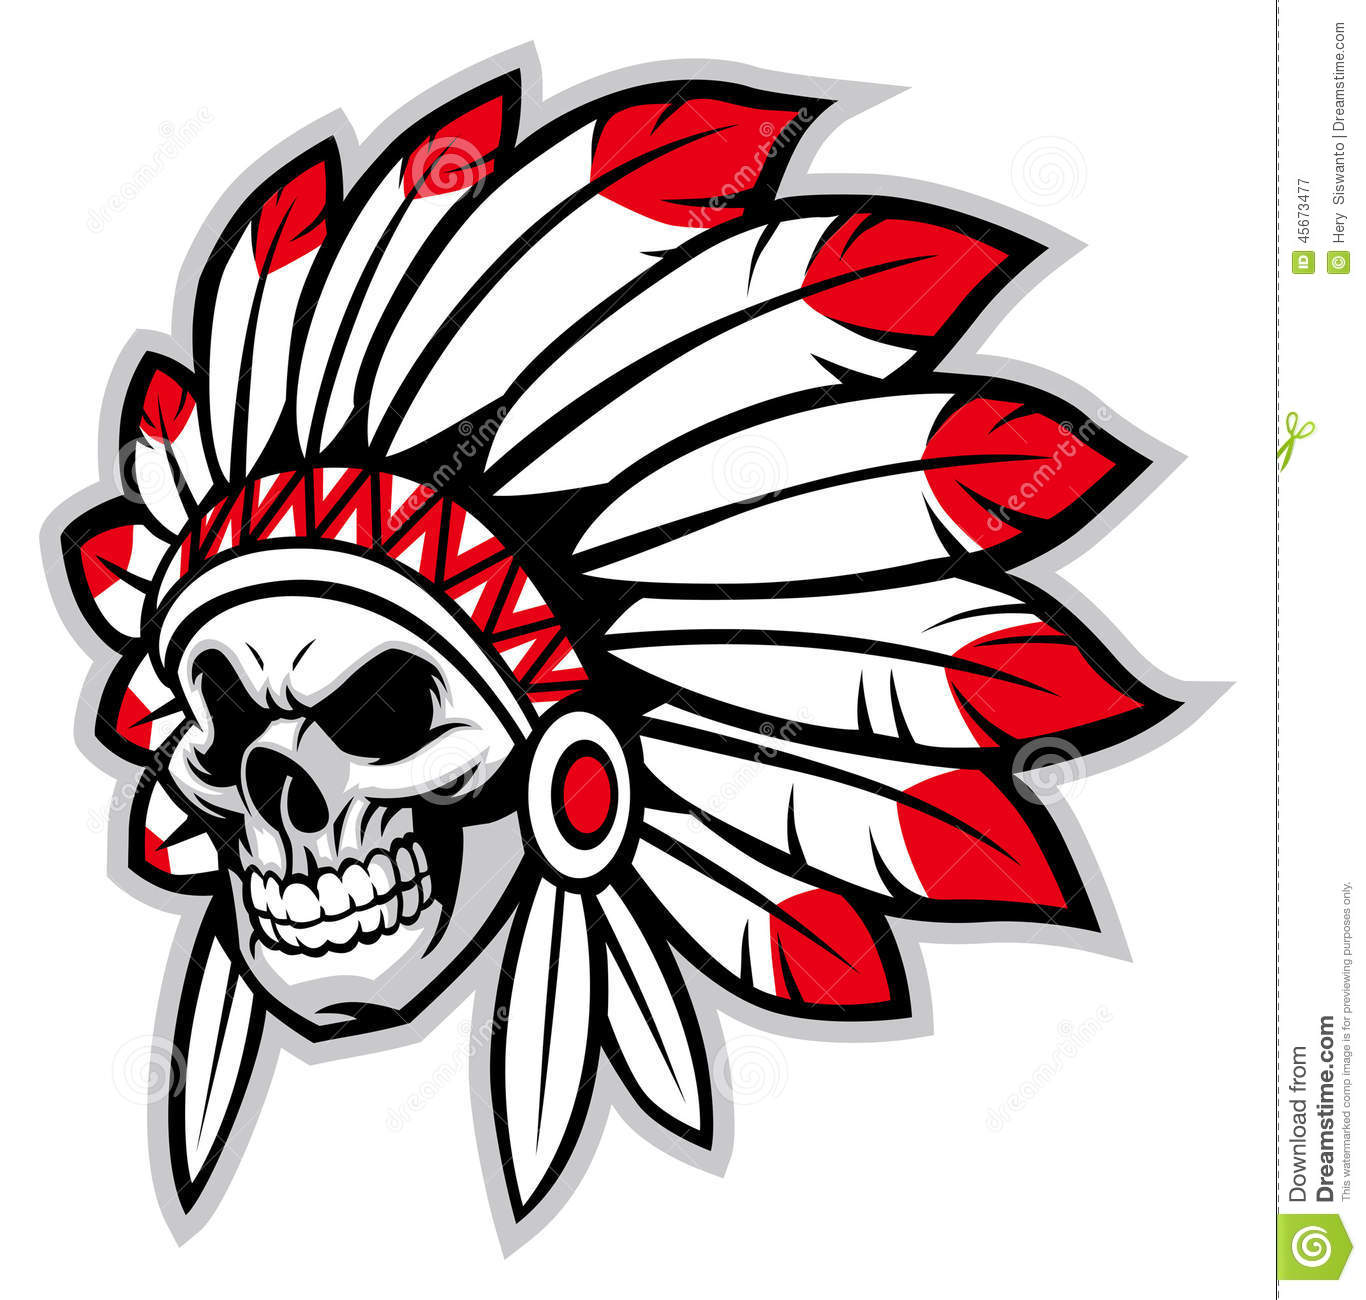 1366x1300 Headdress Clipart Indian Head